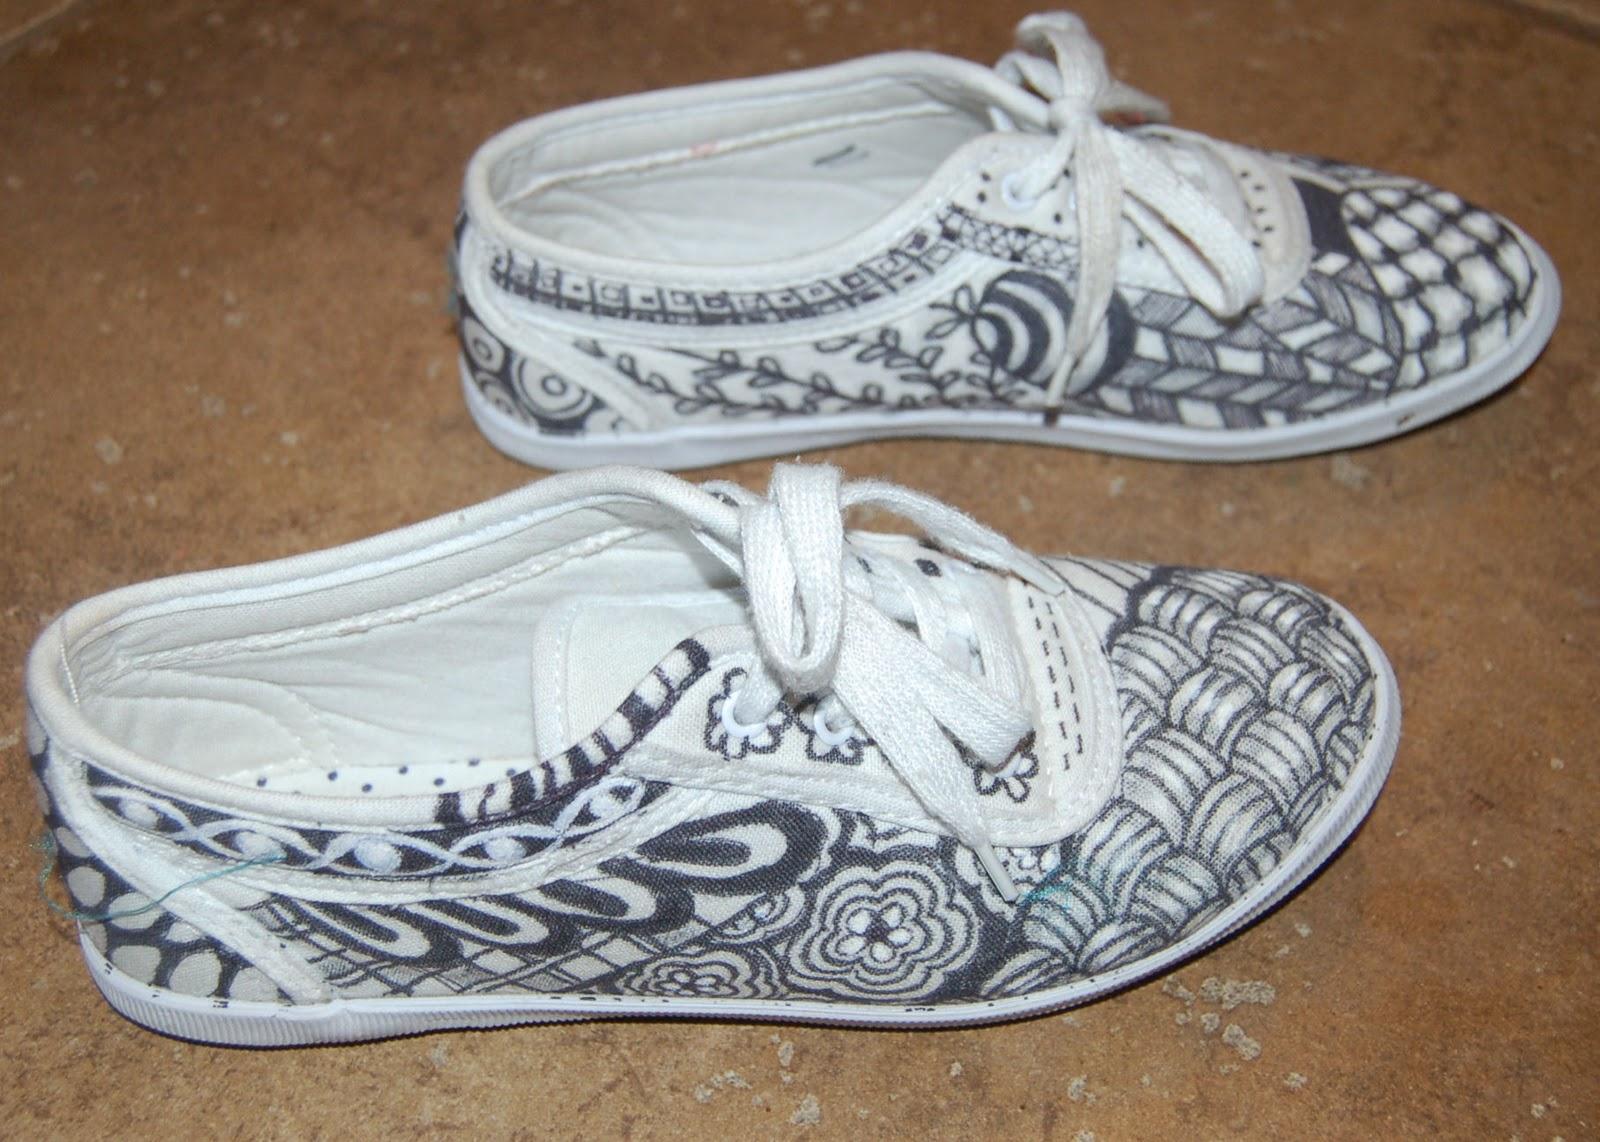 Drawn shoe zentangle #3